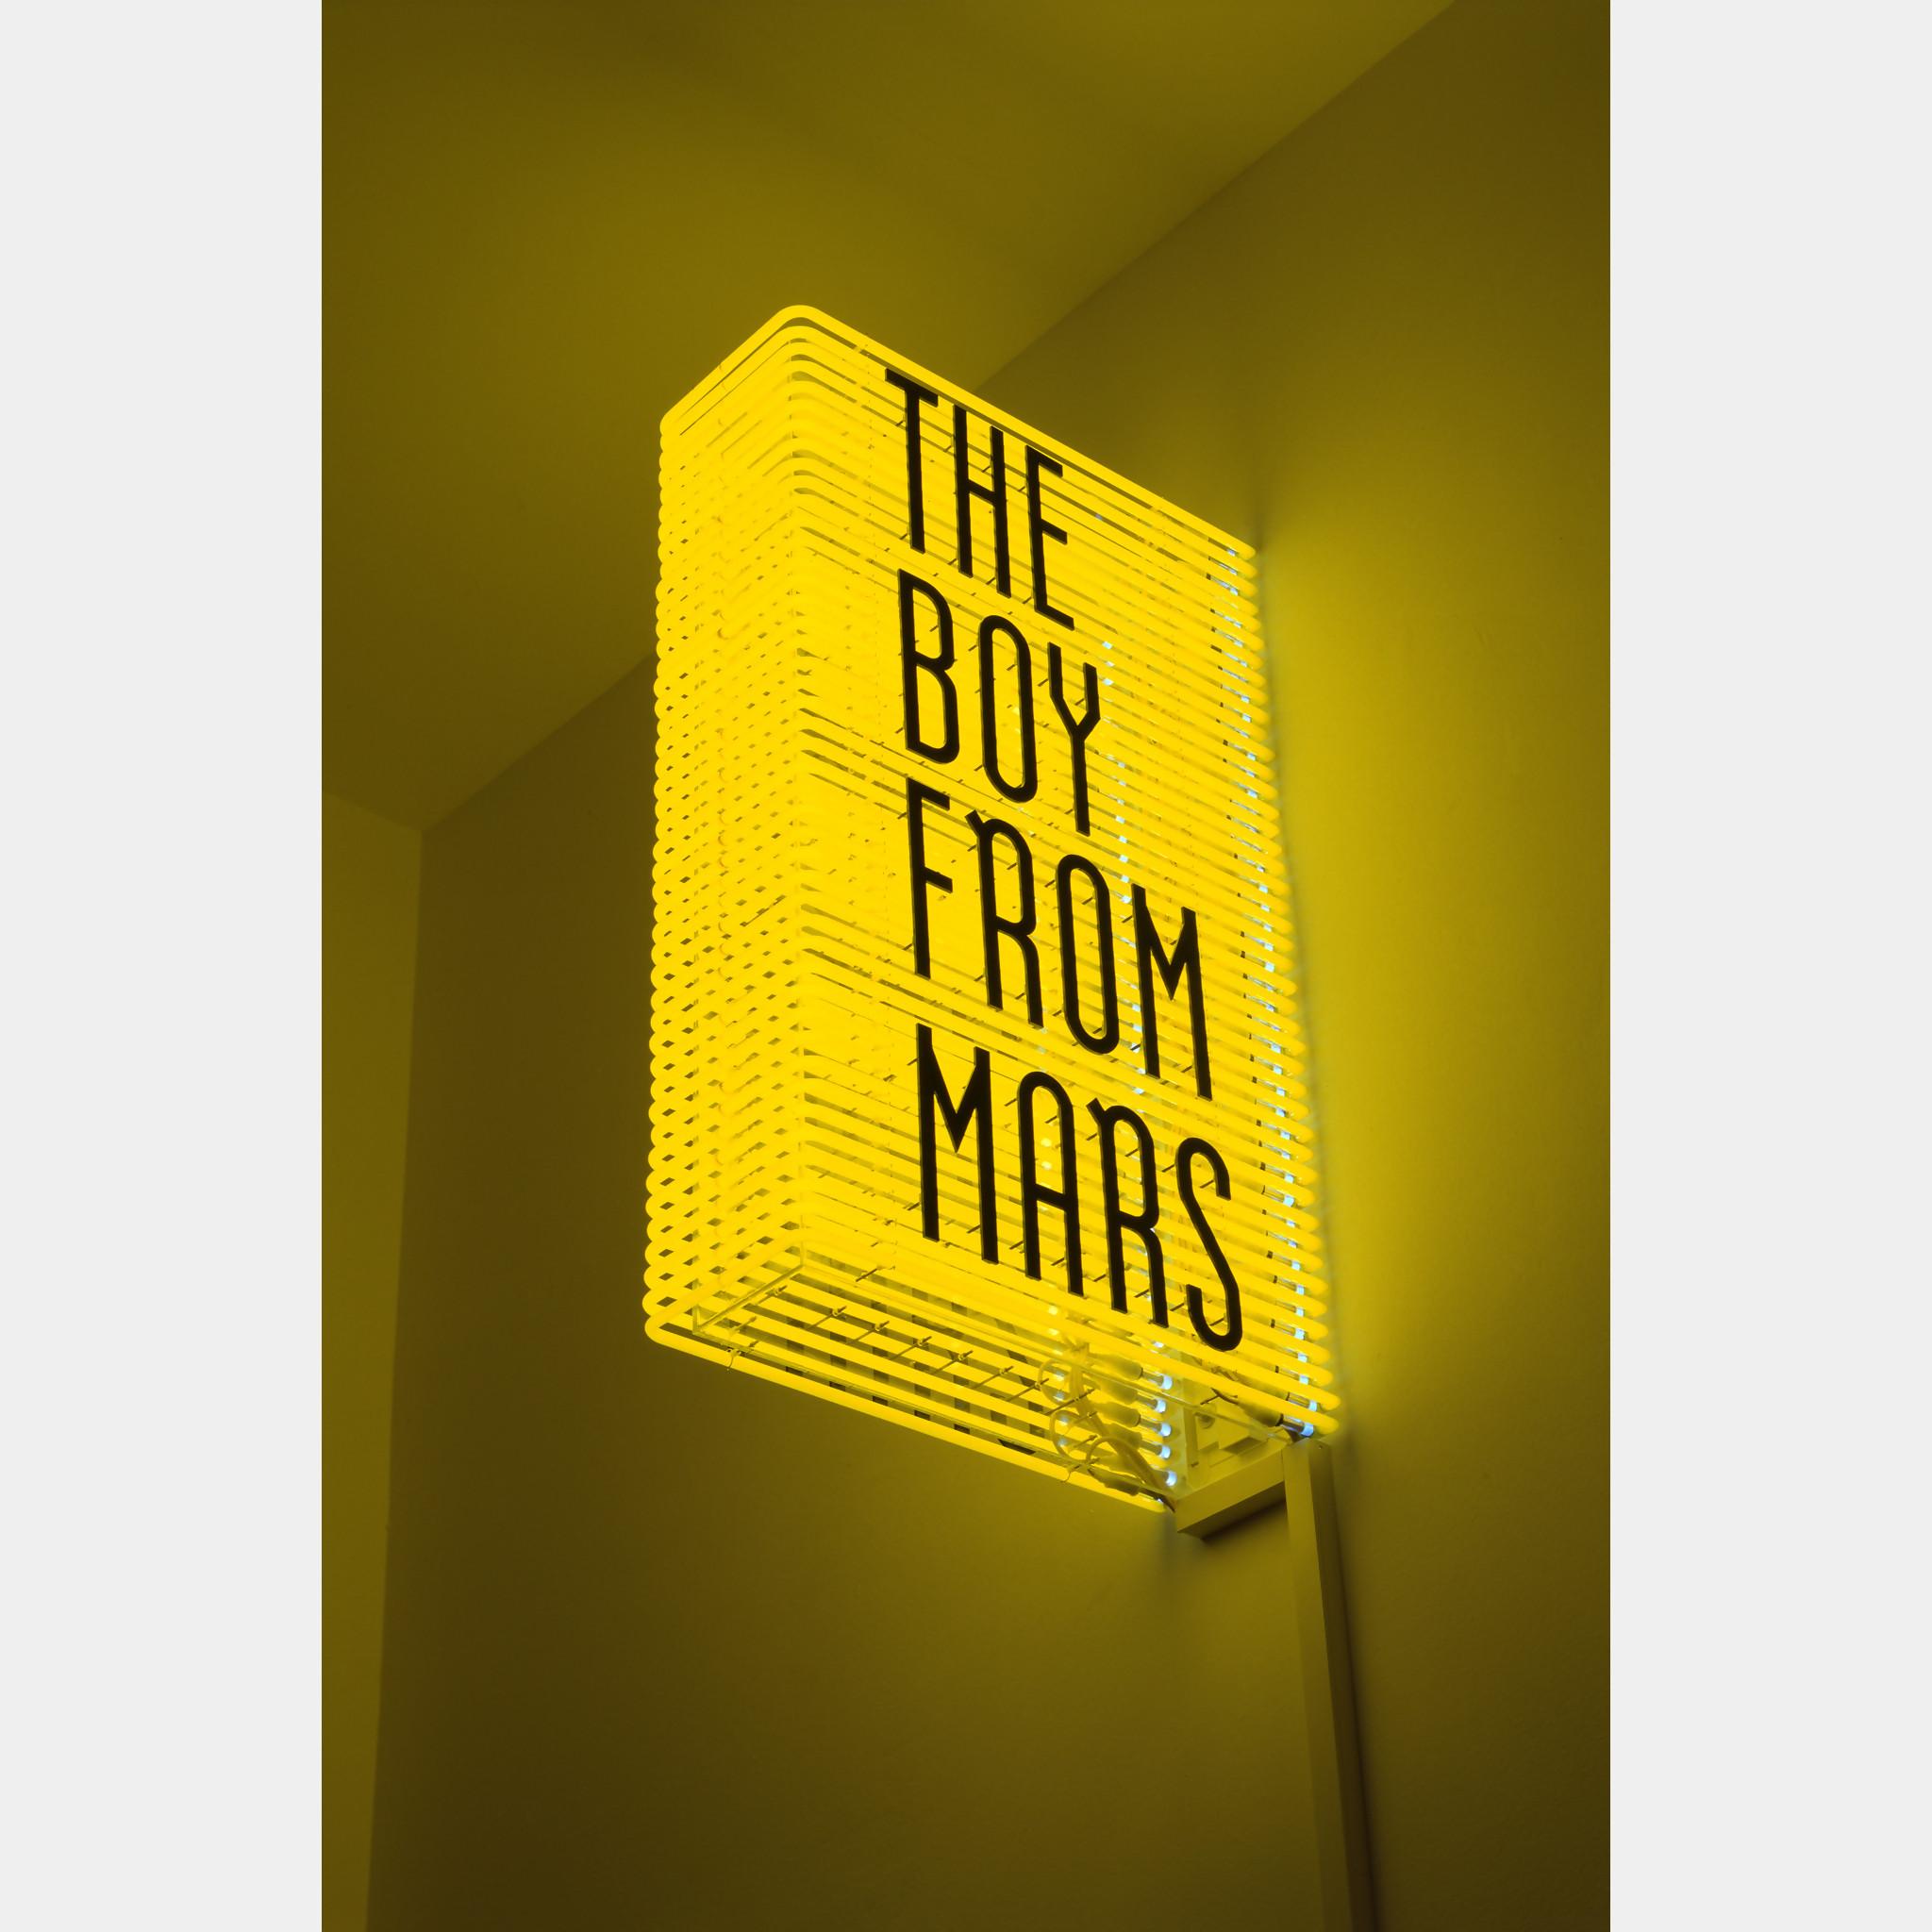 Philippe Parreno, The Boy From Mars, 2005, 44 neon tubes, metal, transparent plexiglass, 5 transformators, cables, 148 x 90.2 x 41.9 cm